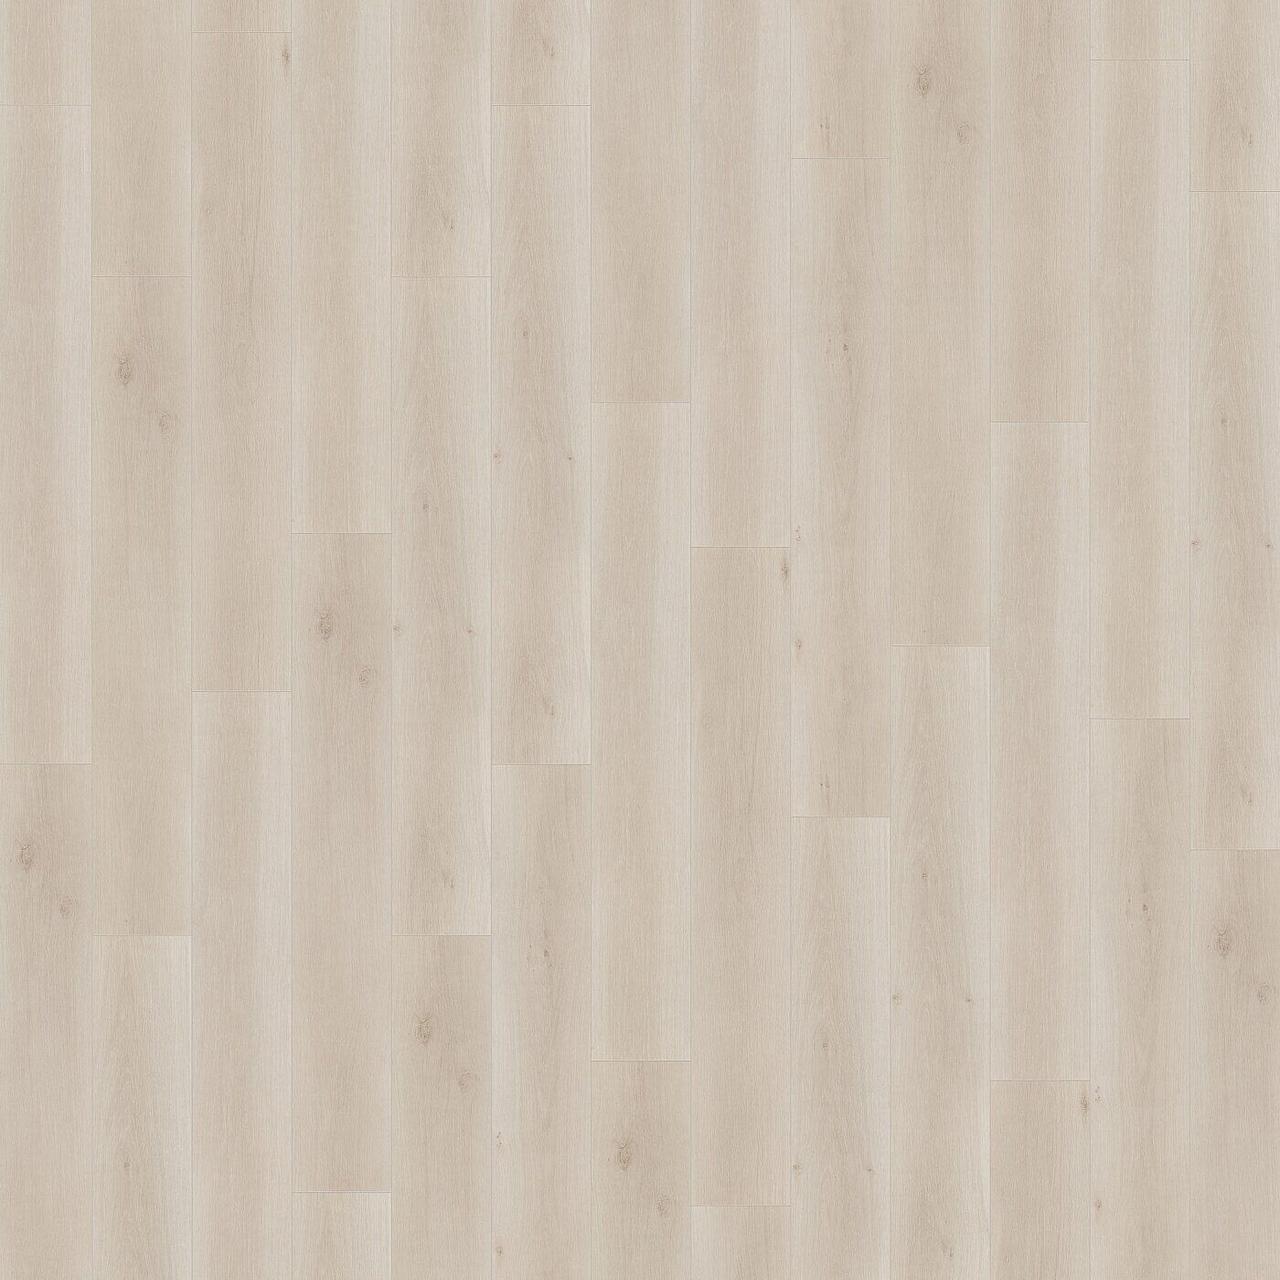 Ламинат WINEO Дуб натуральный белый